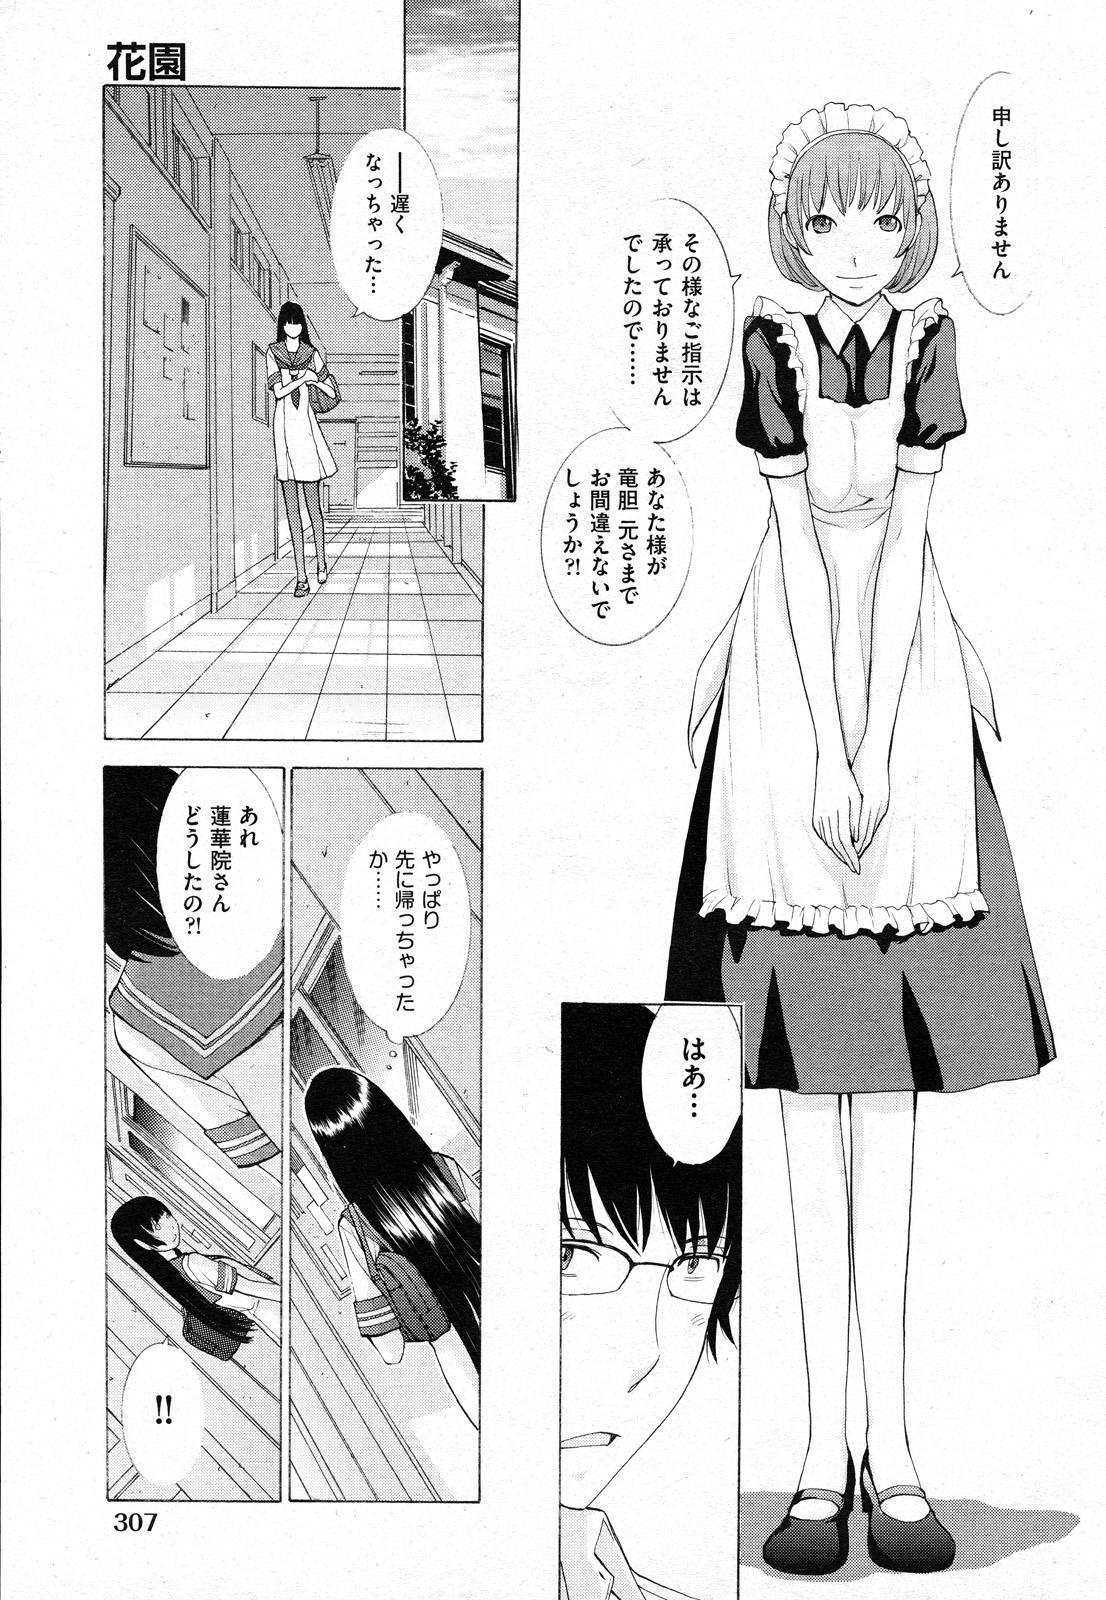 Hanazono 37